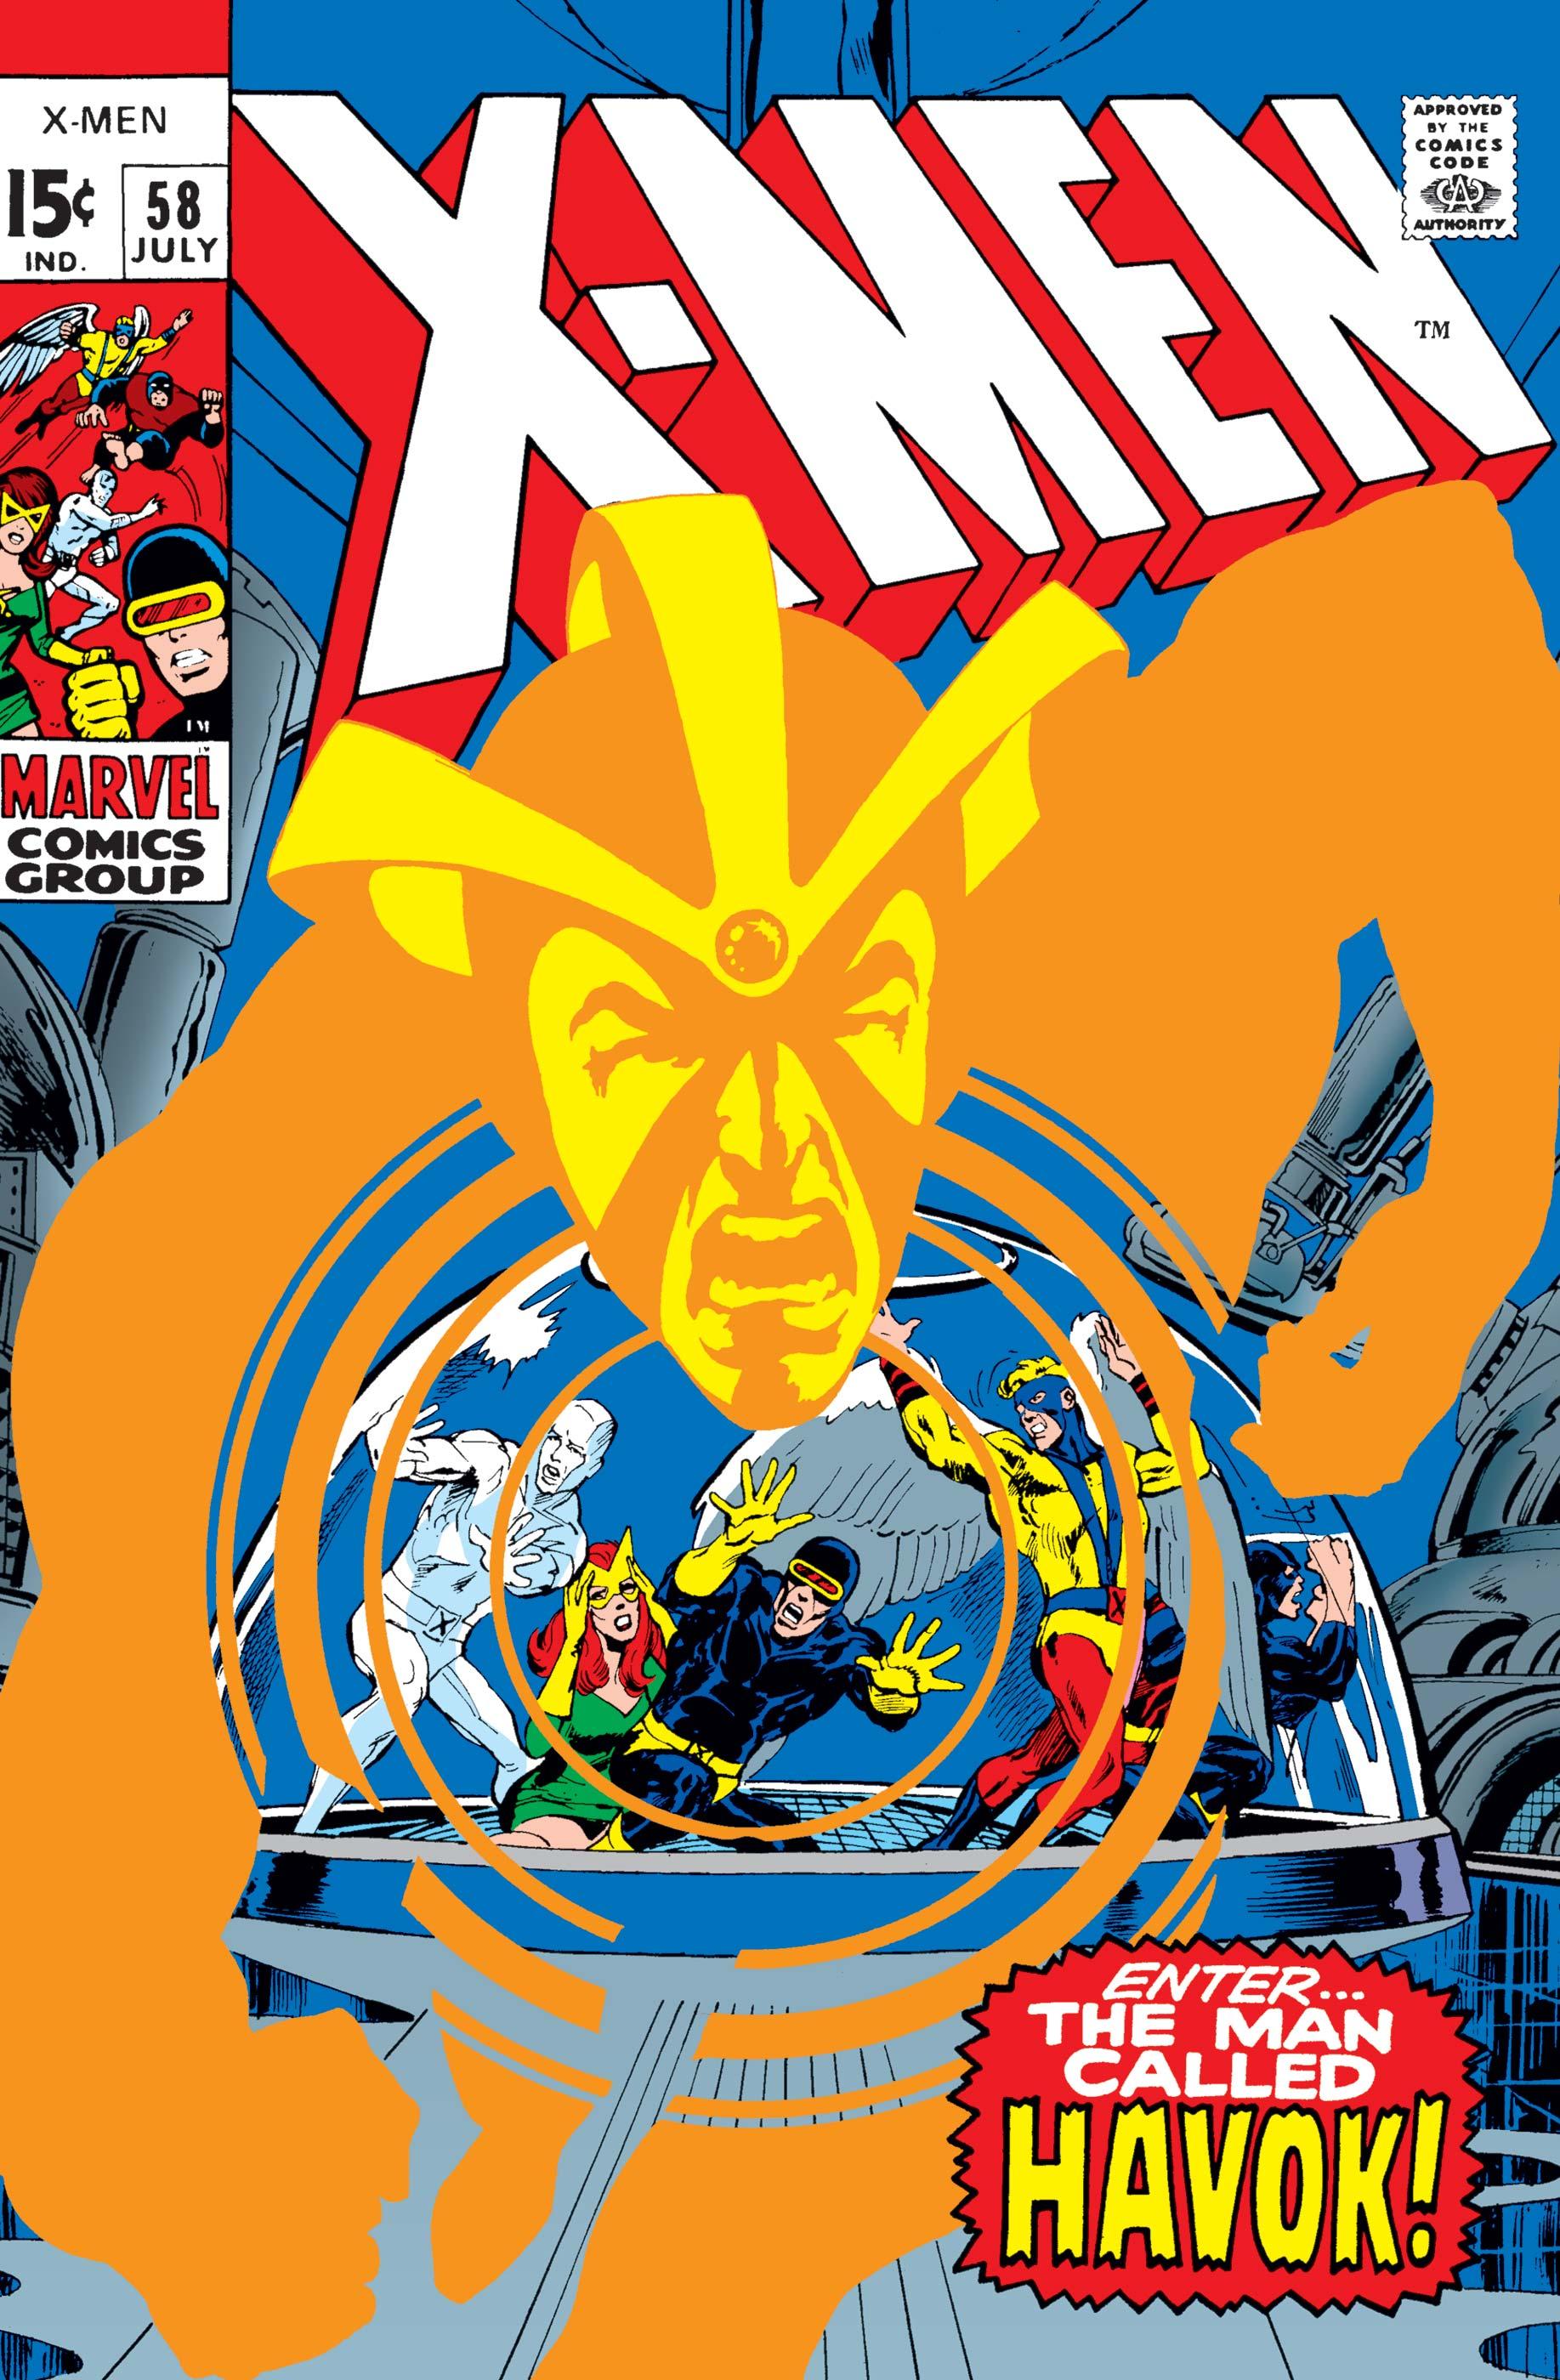 Uncanny X-Men (1963) #58